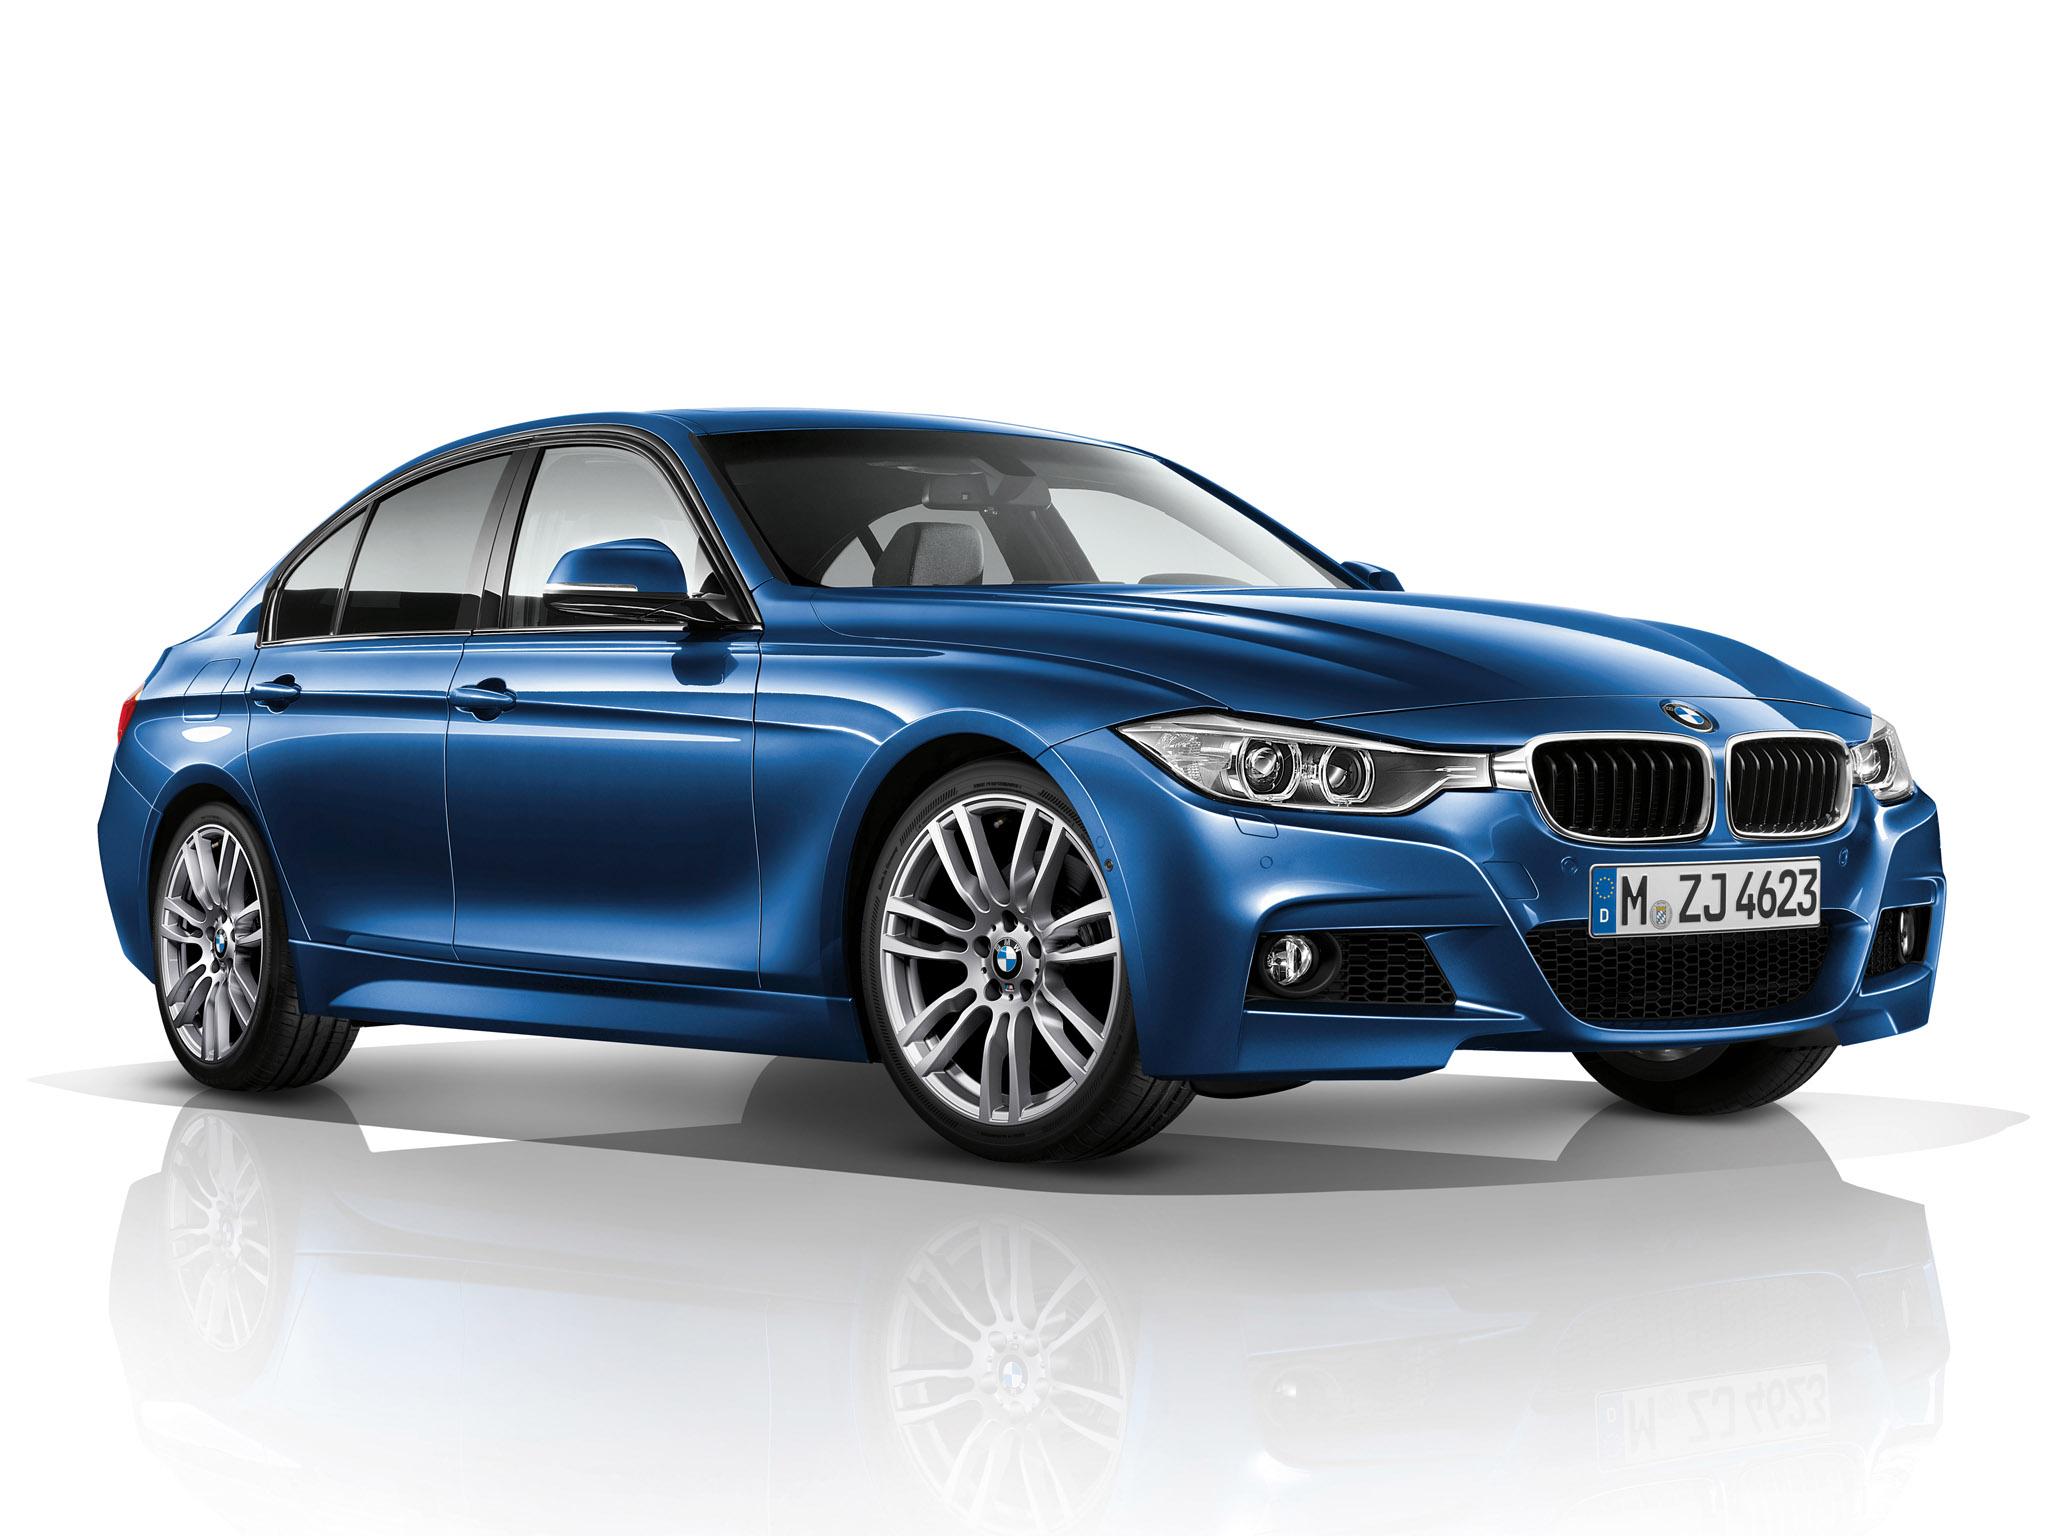 Buy Cars Online Sell Car Online Buy Car Online Car Cars New Car